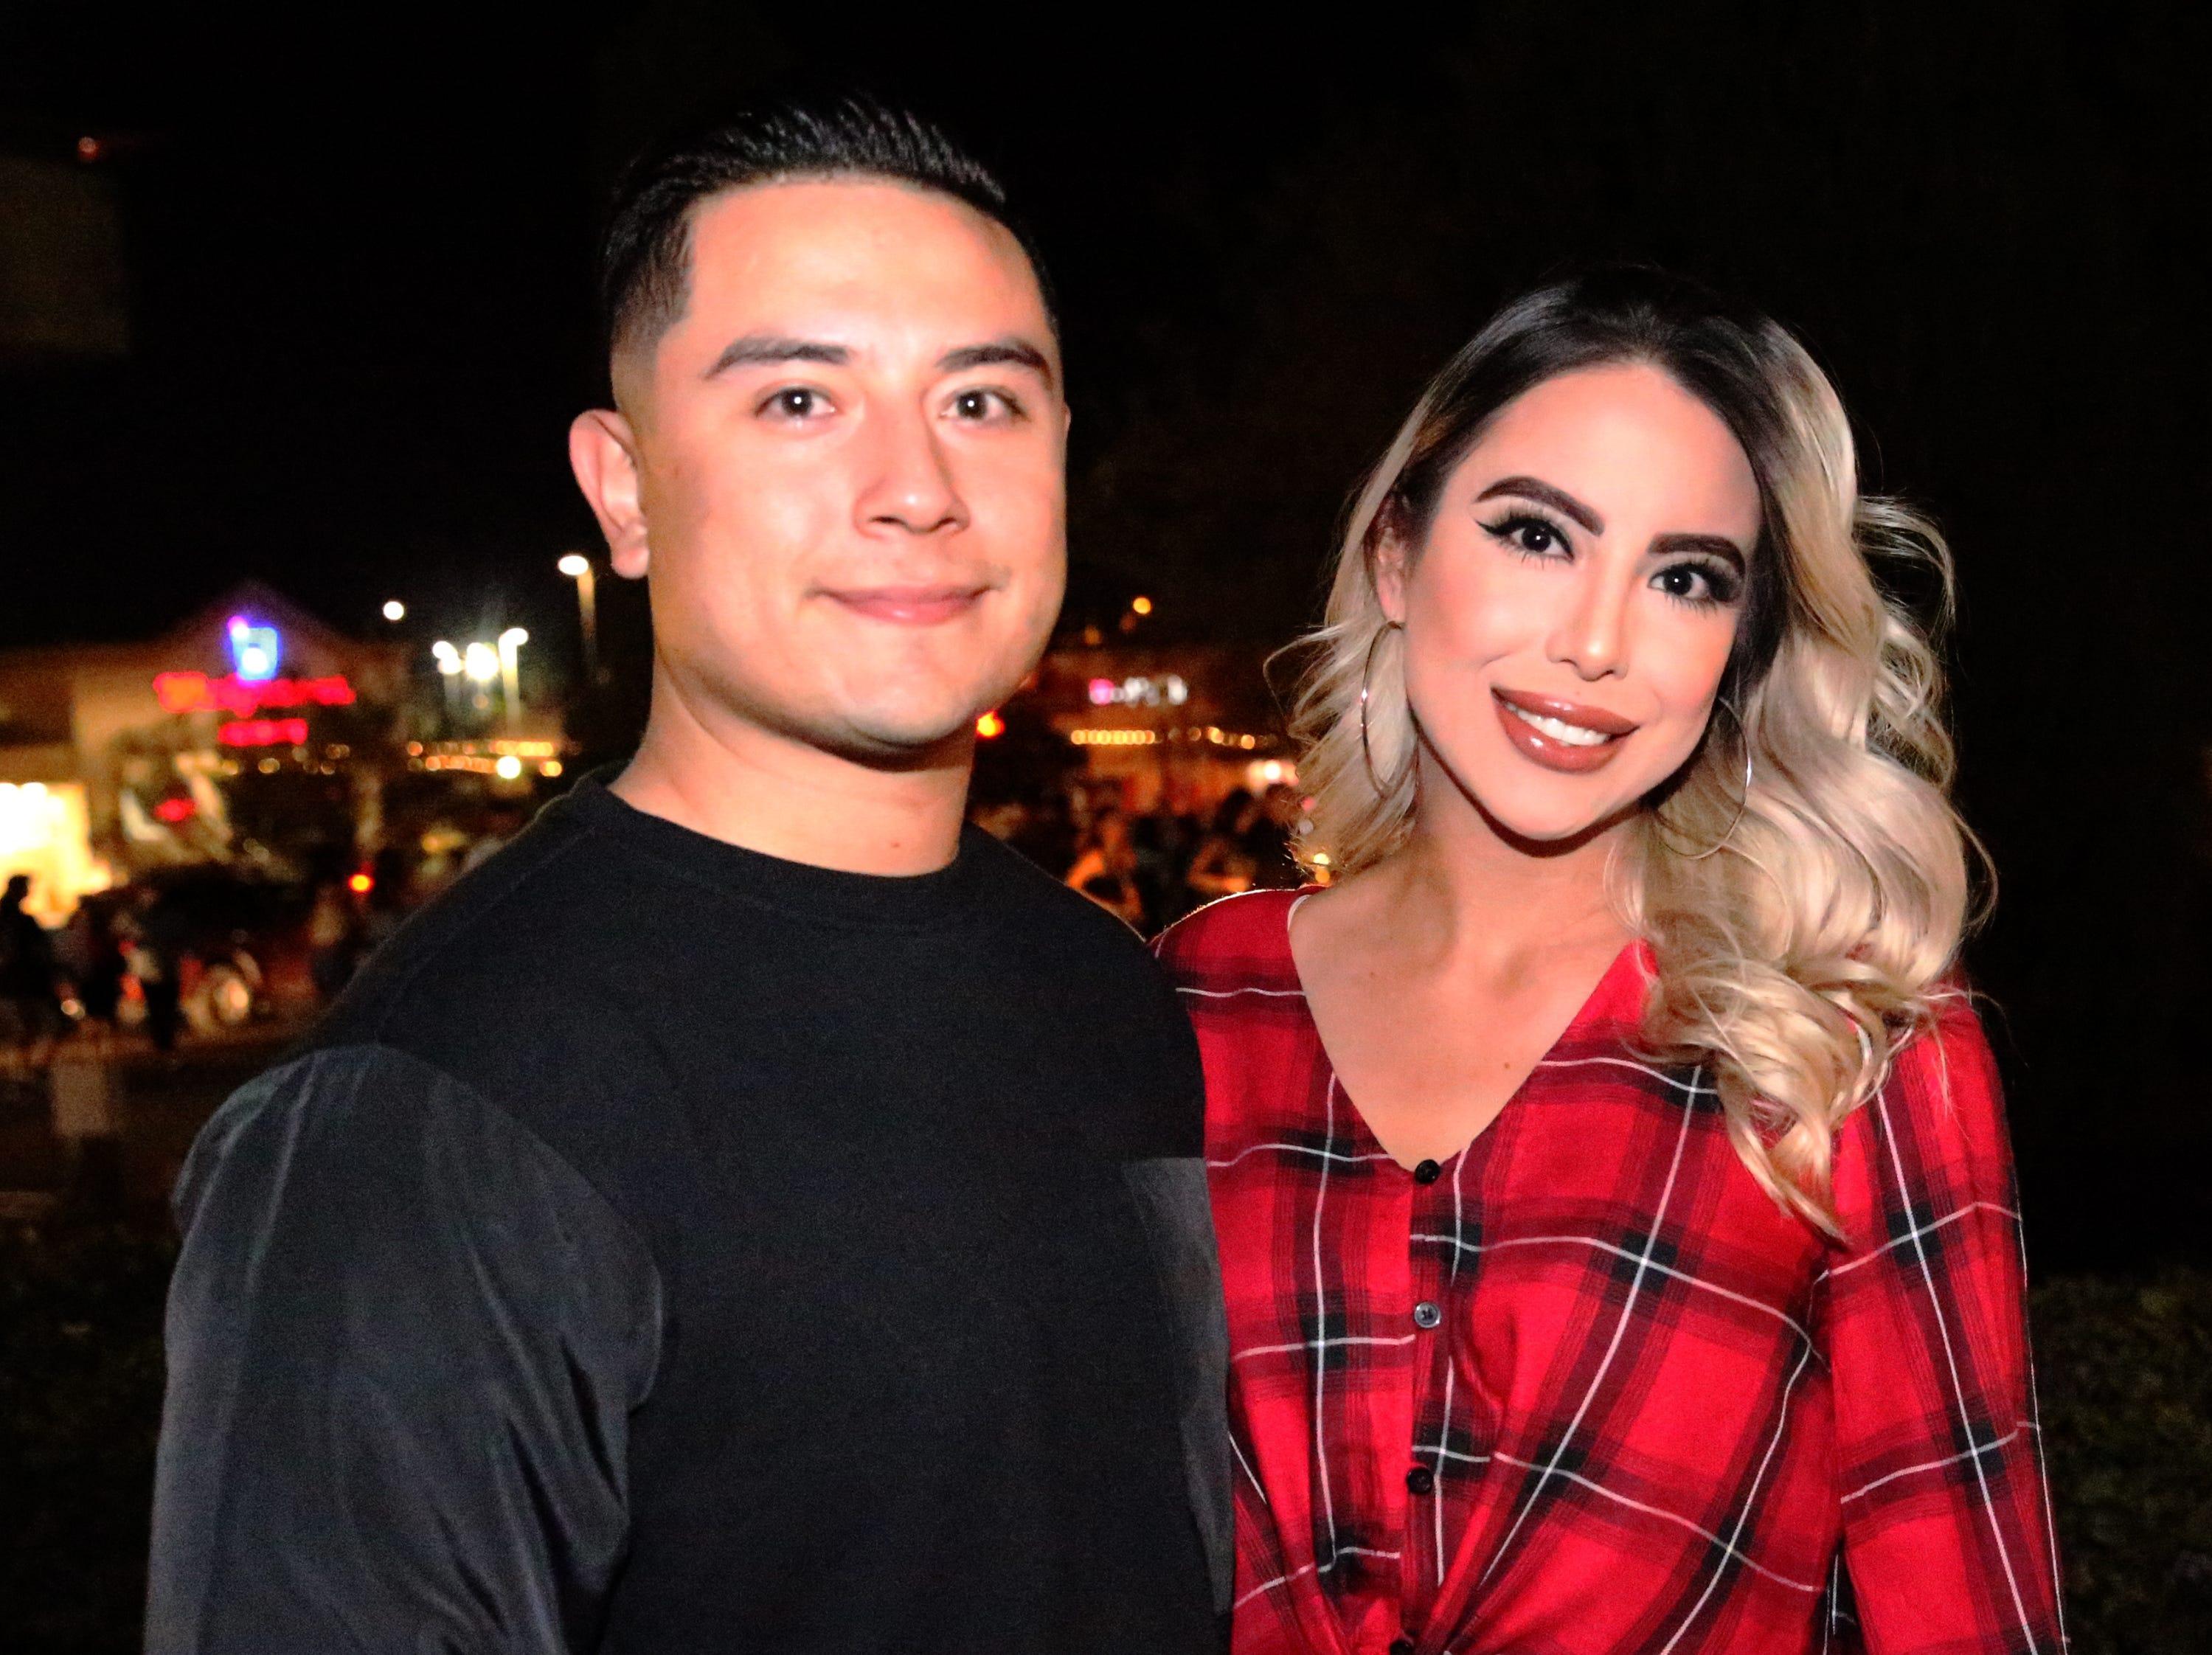 Victor Sanchez and Perla Ortiz.